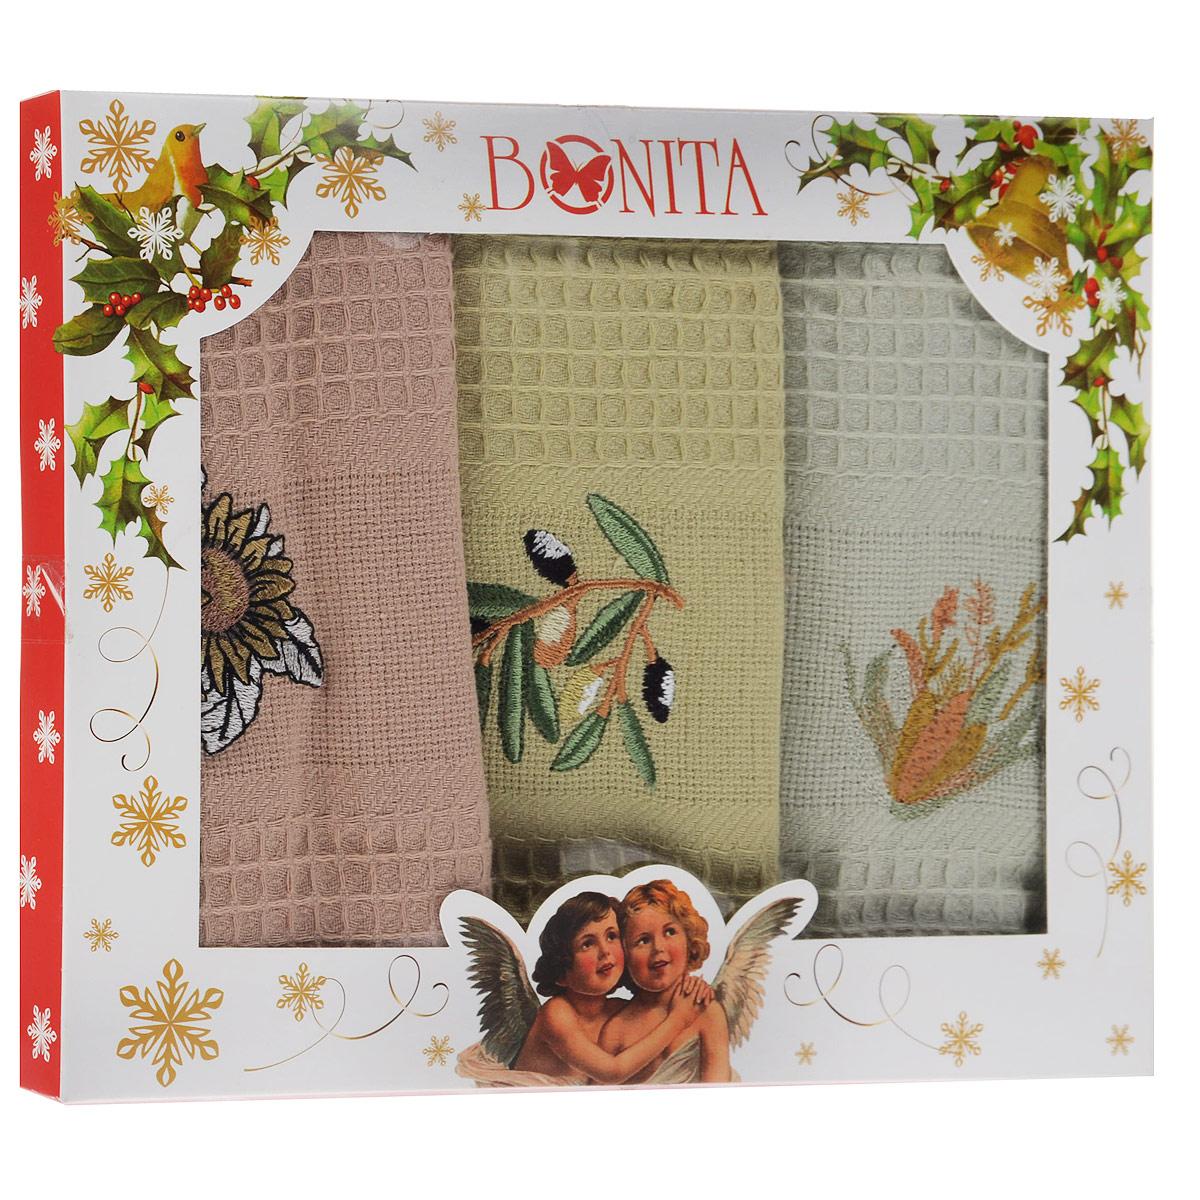 Набор полотенец Bonita Греция, 45 см х 70 см, 3 шт-три вида комплектации01010315381